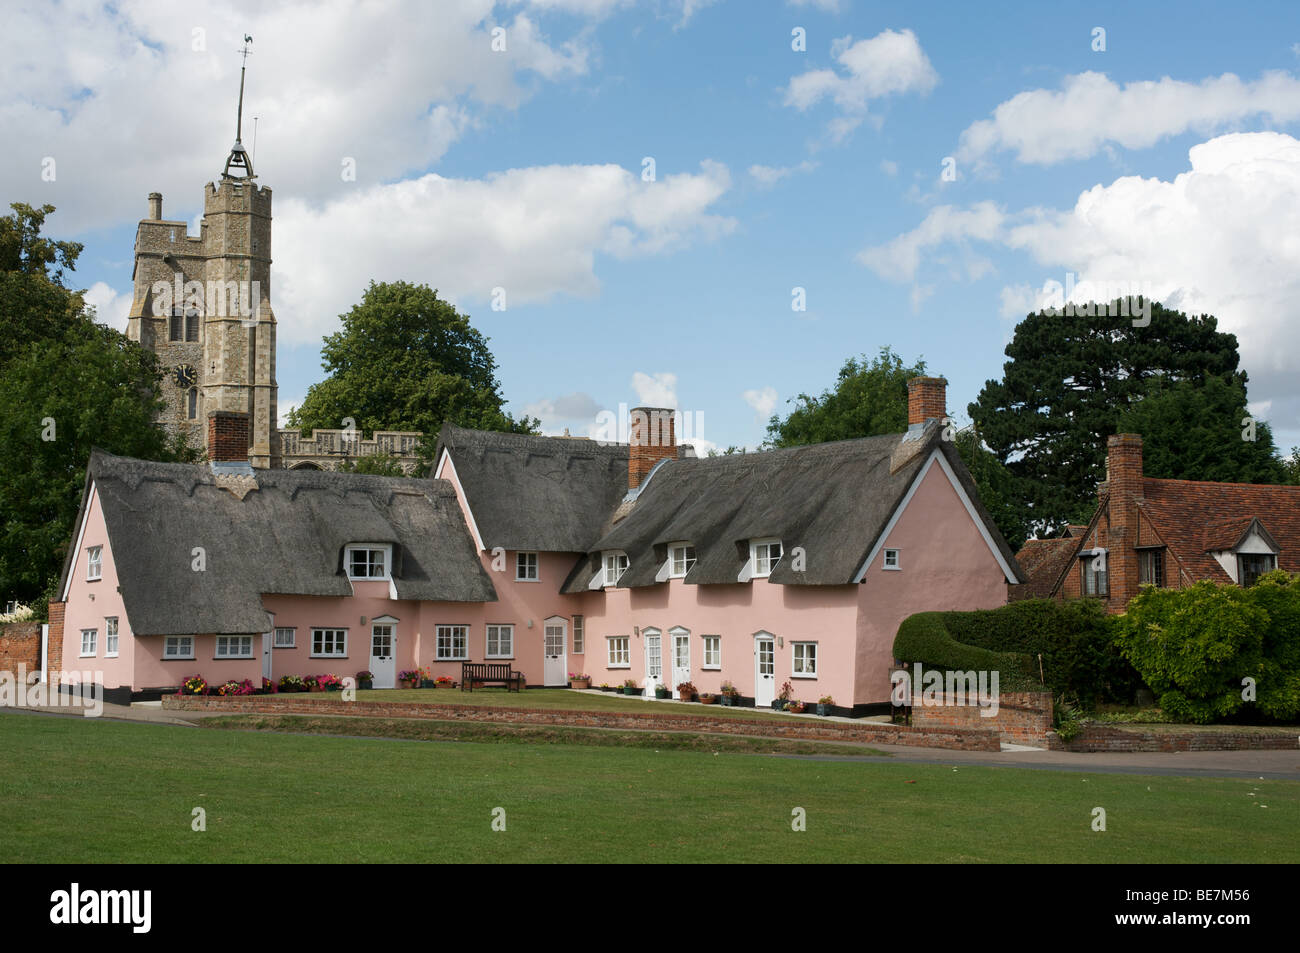 The village of Cavendish, Suffolk, UK. - Stock Image